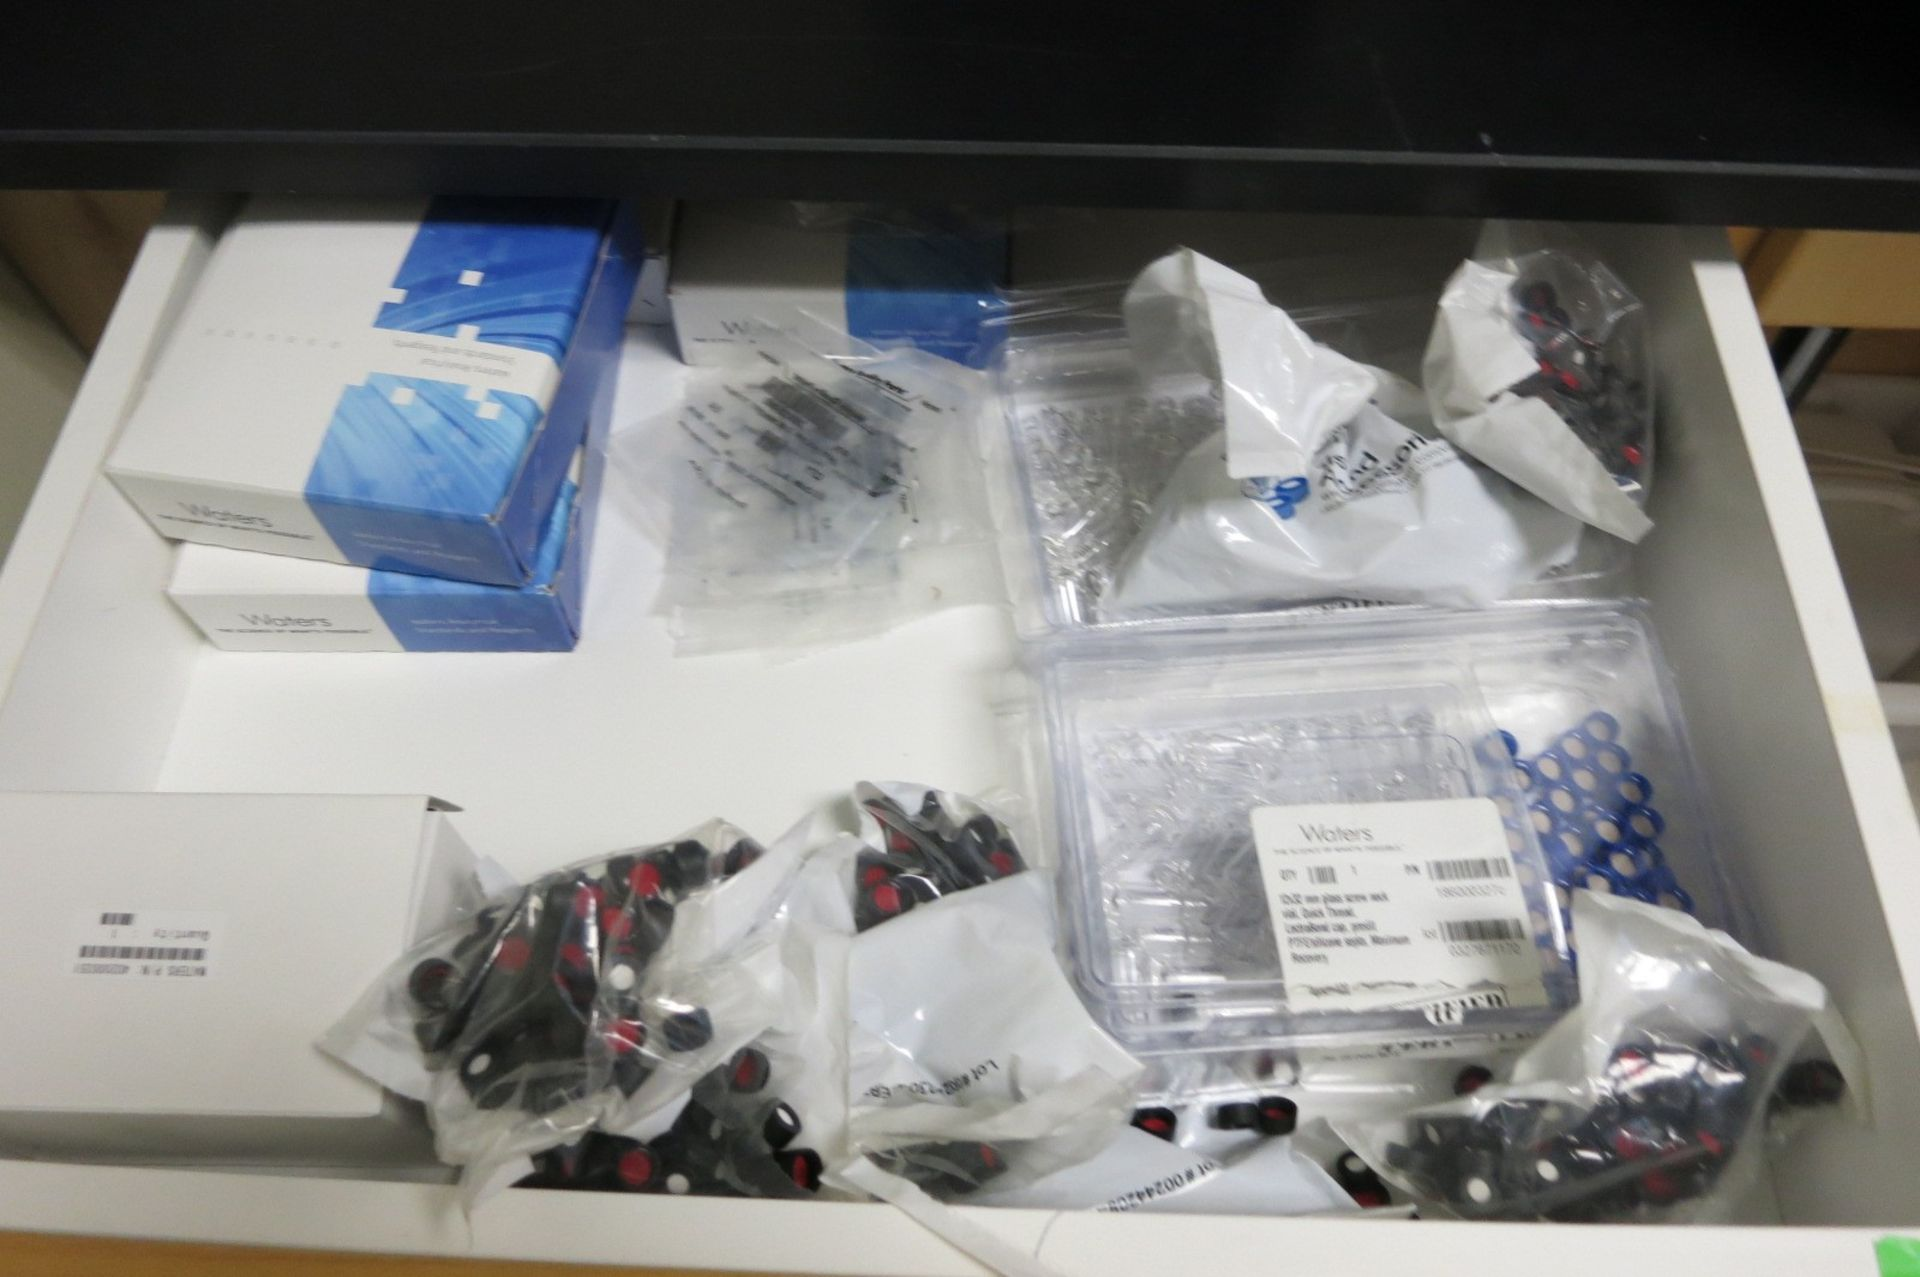 Miscellaneous Lab Supplies